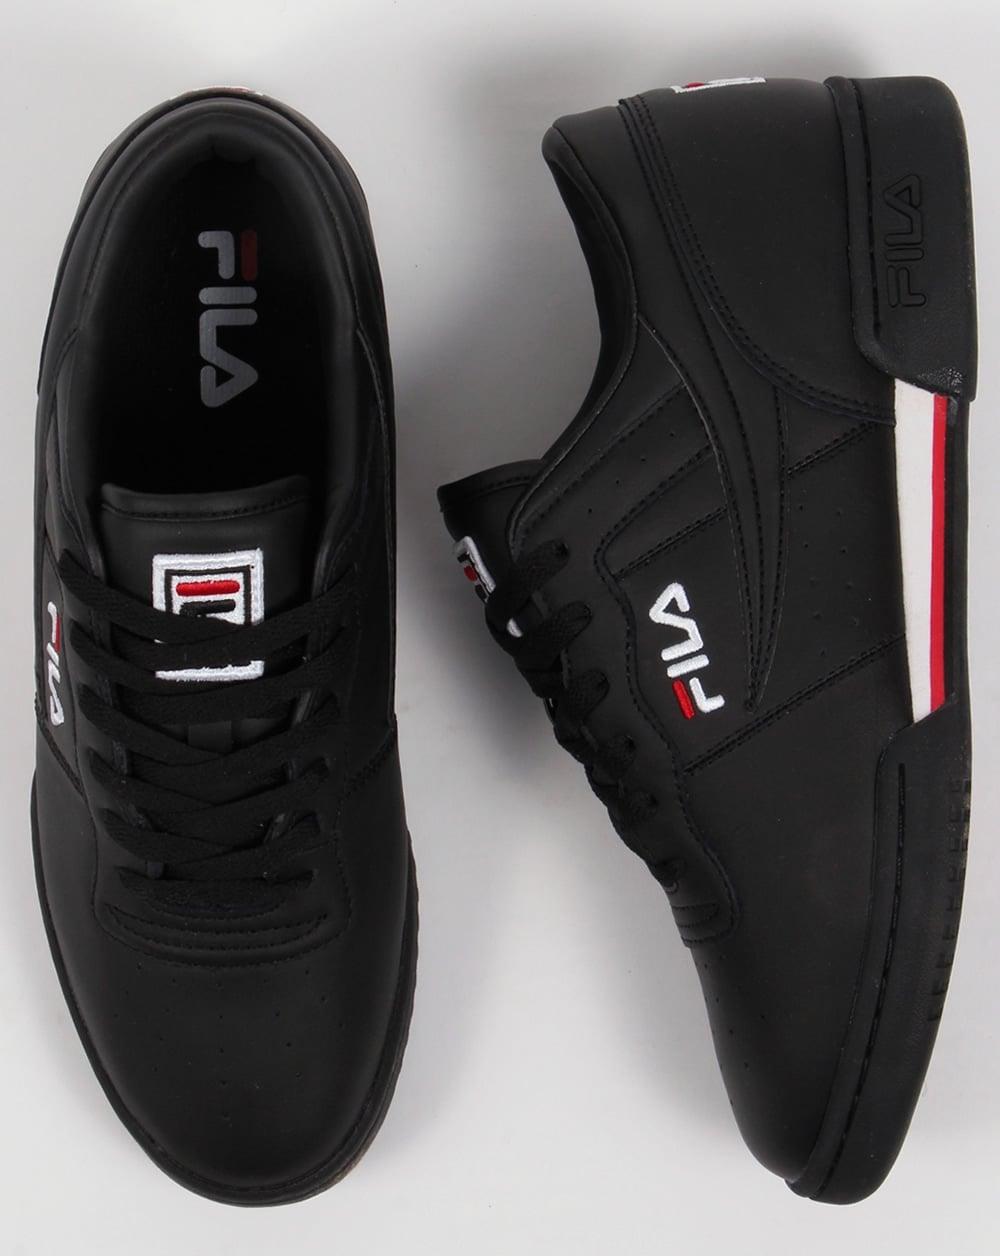 buy online 5bd31 6439a Fila Vintage Original Fitness Trainers Black White Red